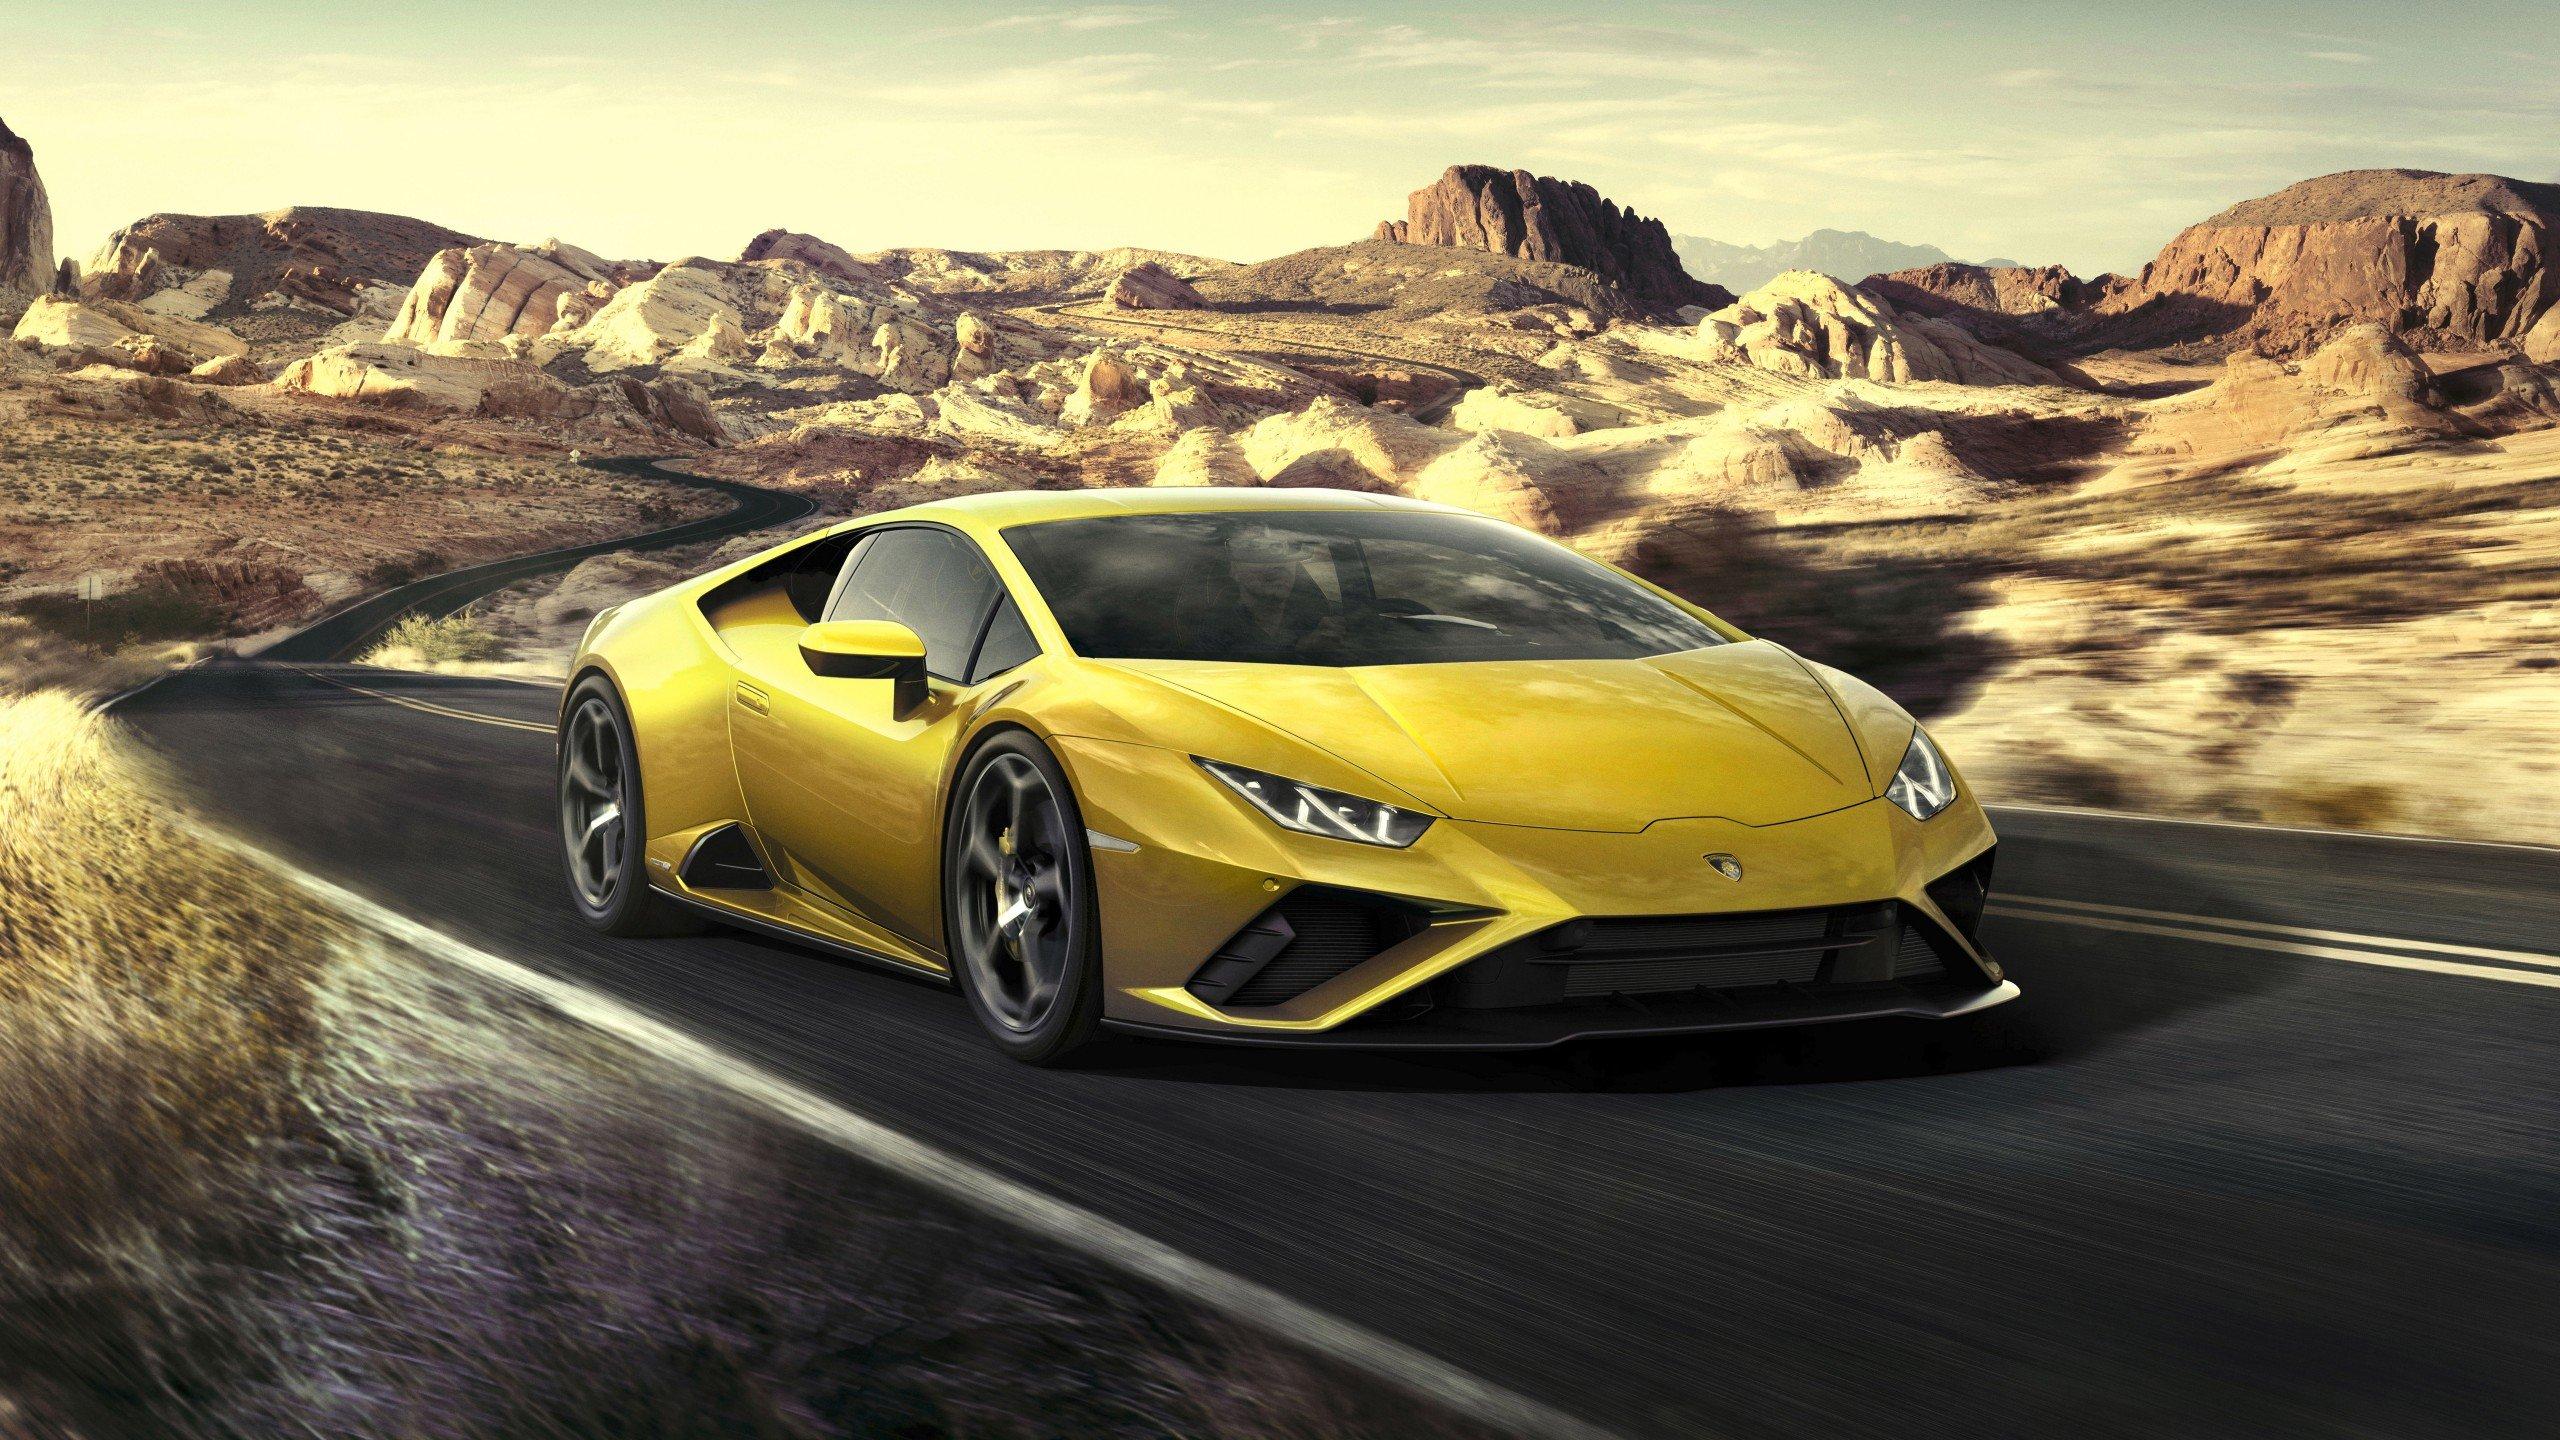 Wallpaper Yellow Lamborghini Huracan